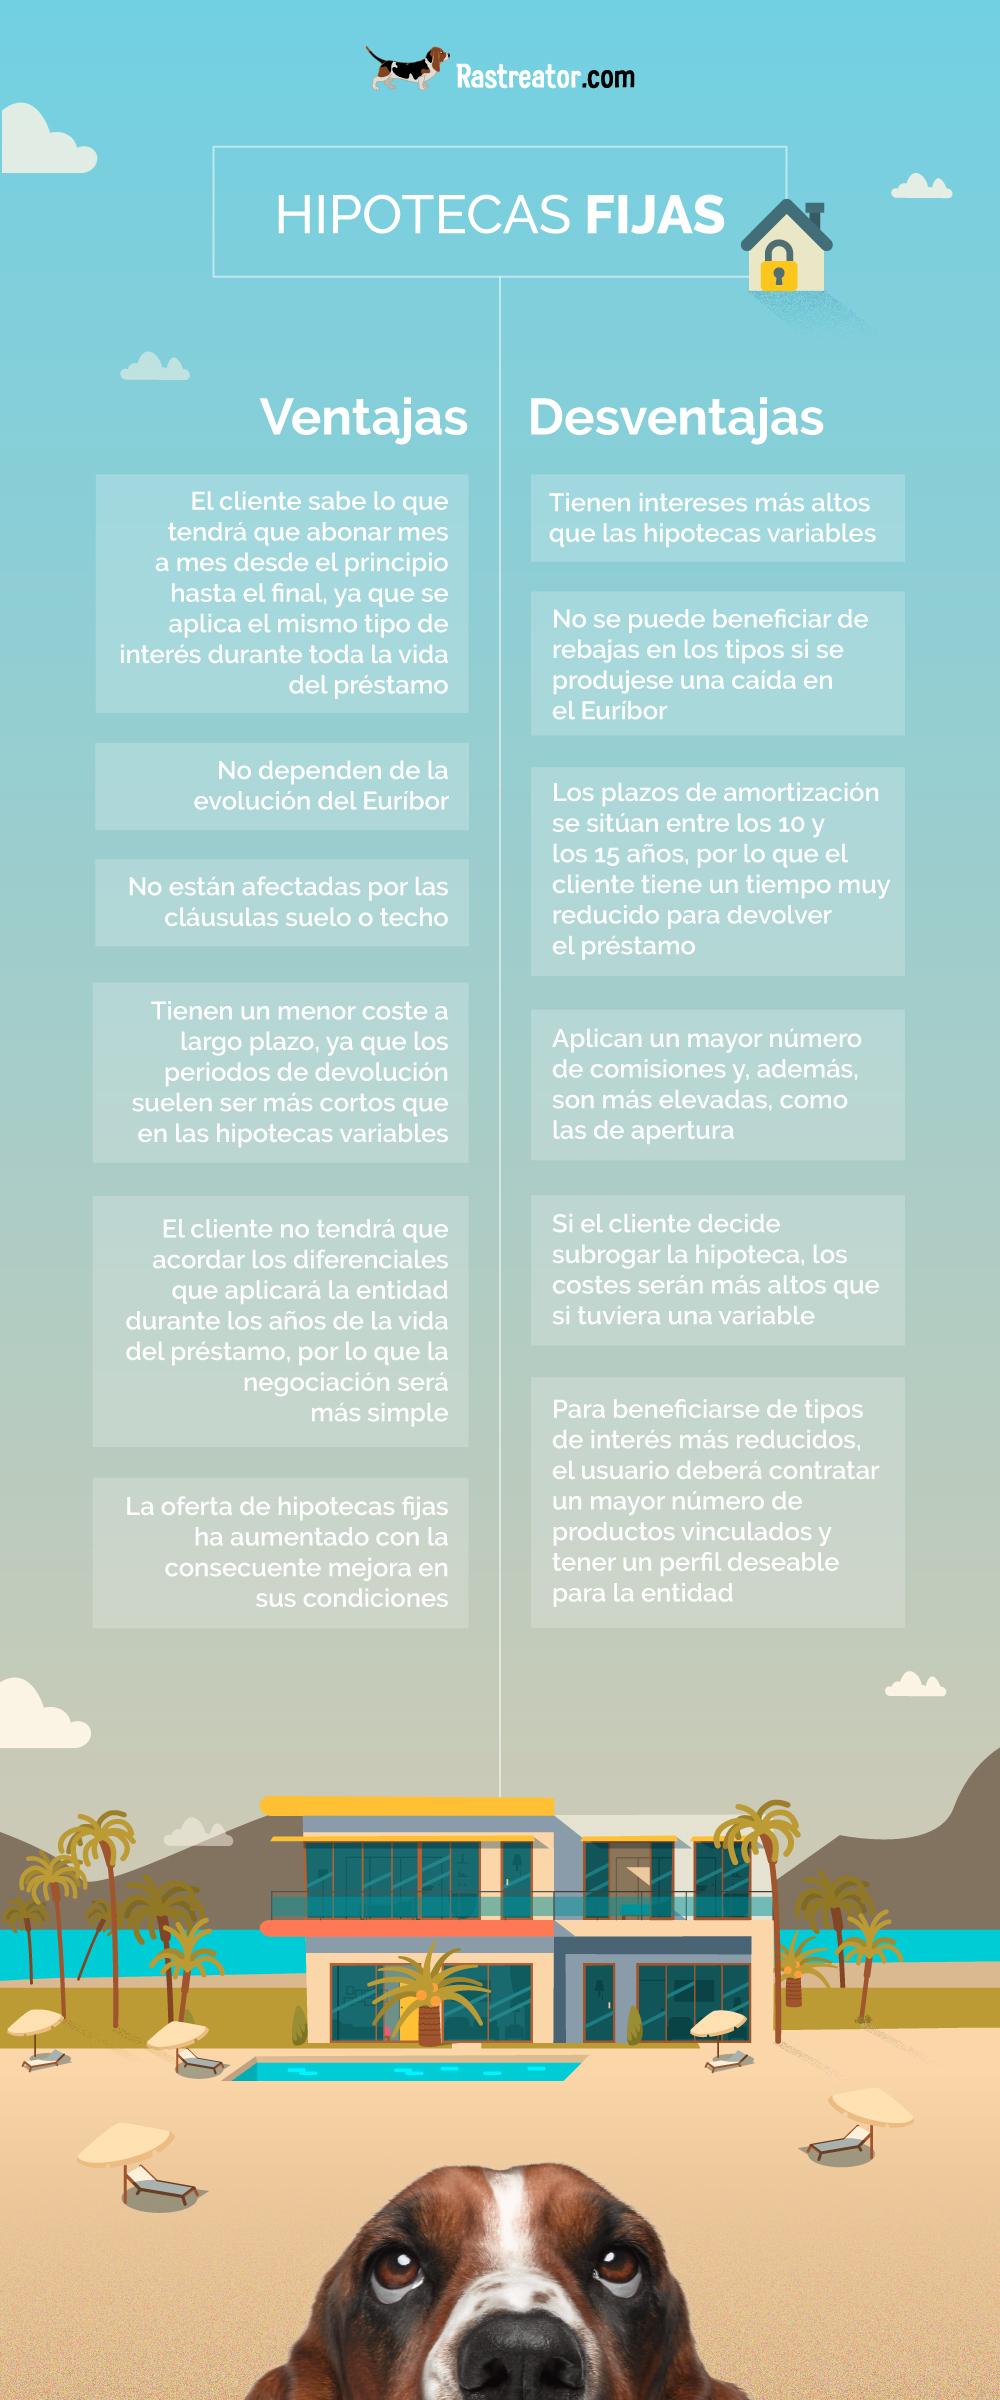 rastreator_ventajas y desventajas de las hipotecas fijas